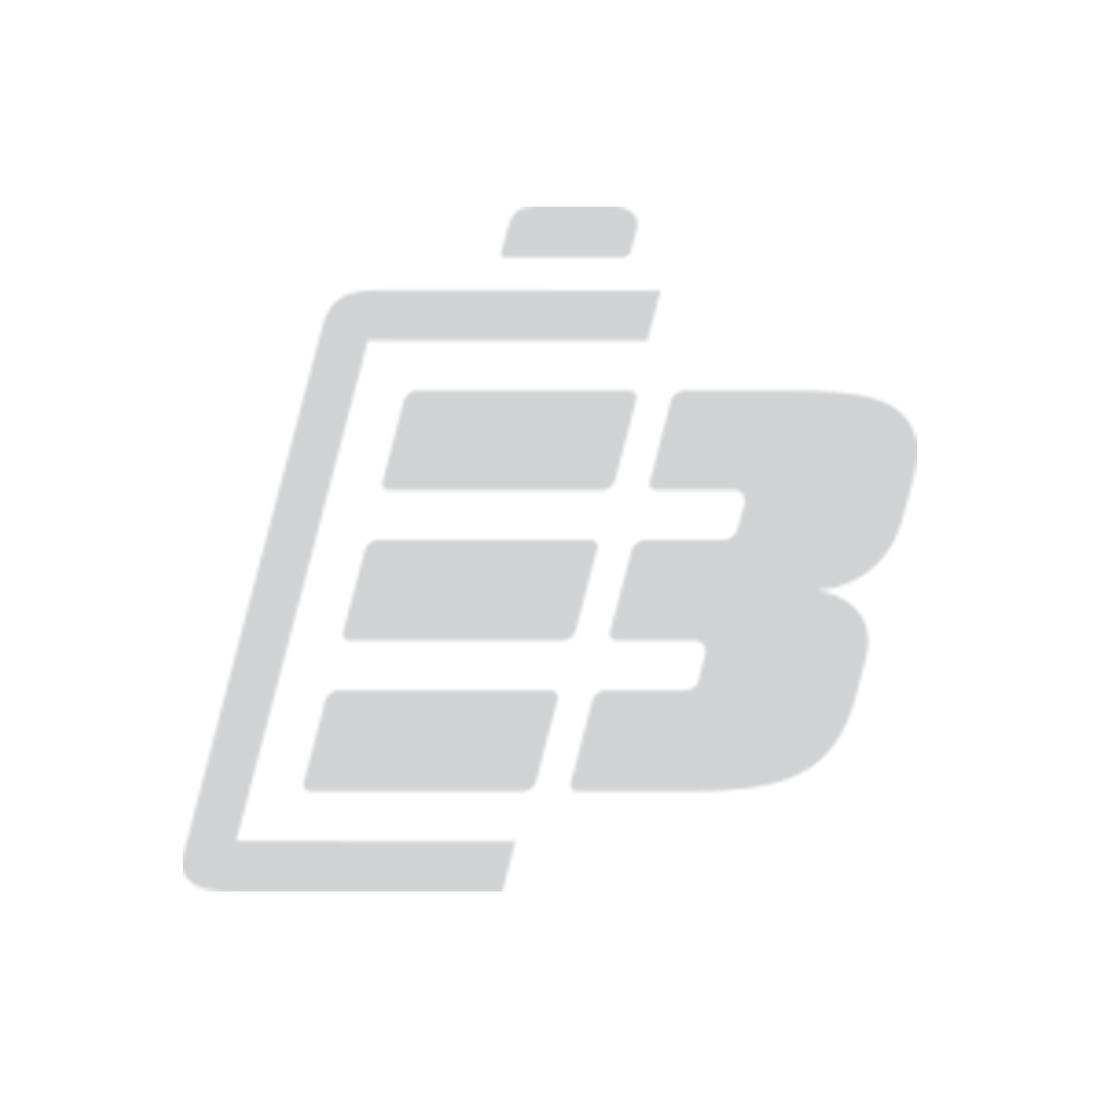 Efan C2 2-bay USB Charger